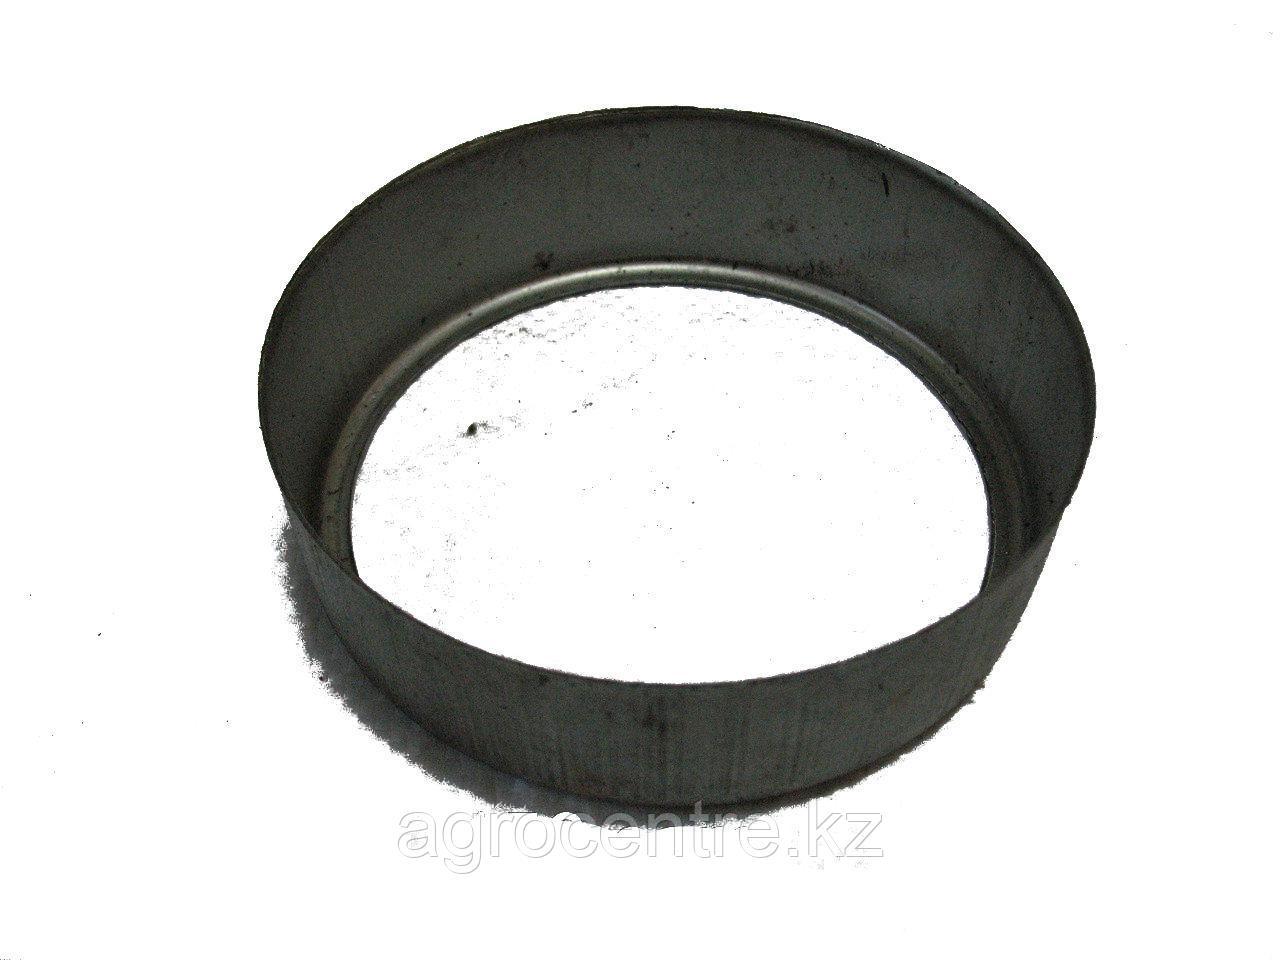 Пыльник цапфы ДТ-75 (77.39.124-1)